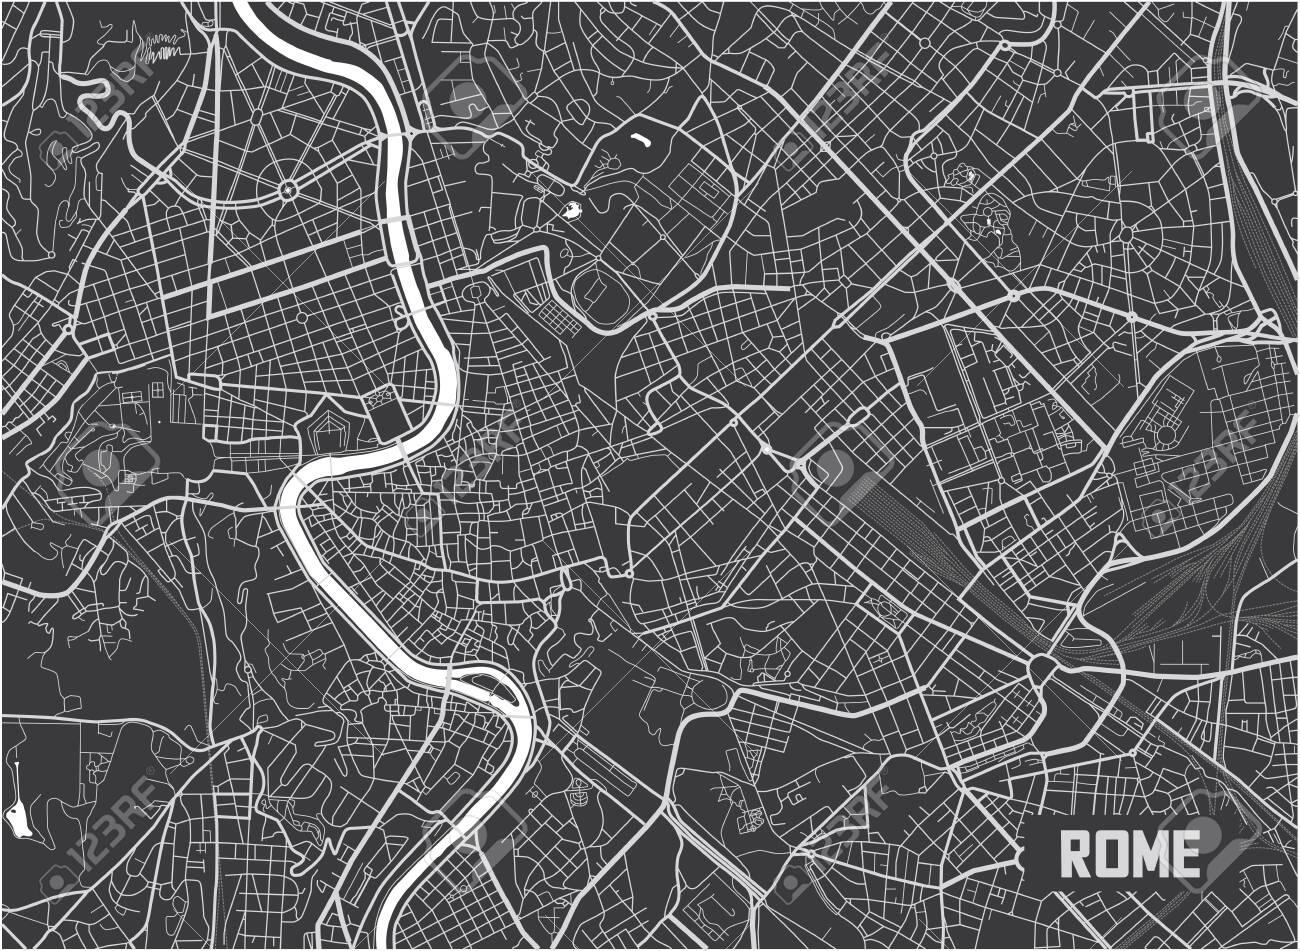 Minimalistic Rome city map poster design. - 122656864